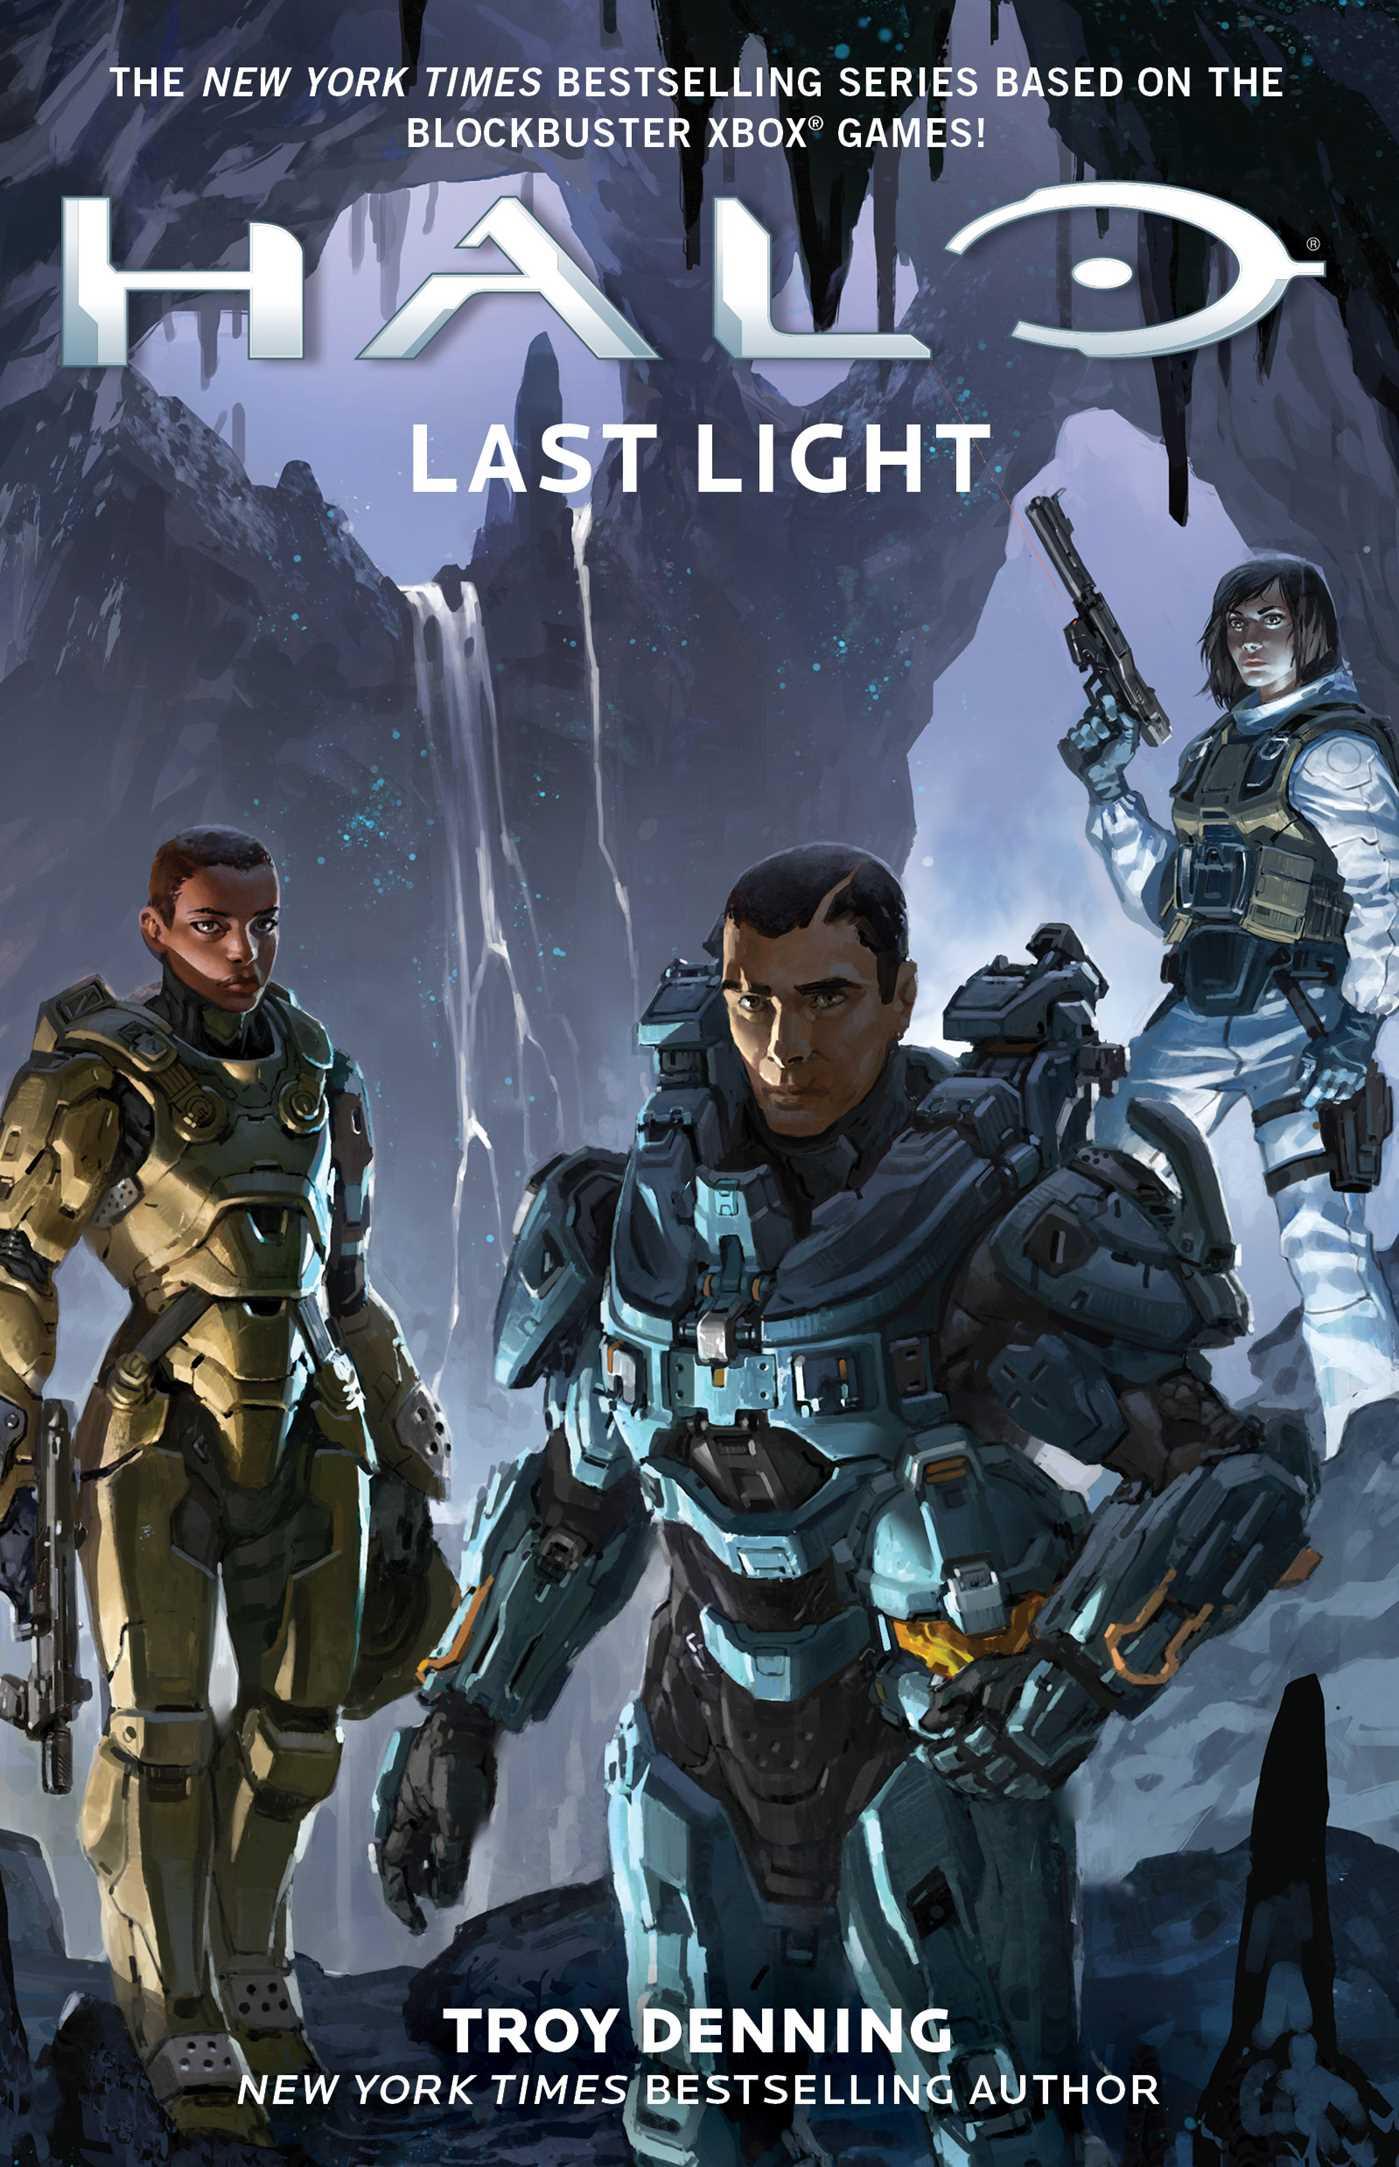 Last light 9781501103360 hr